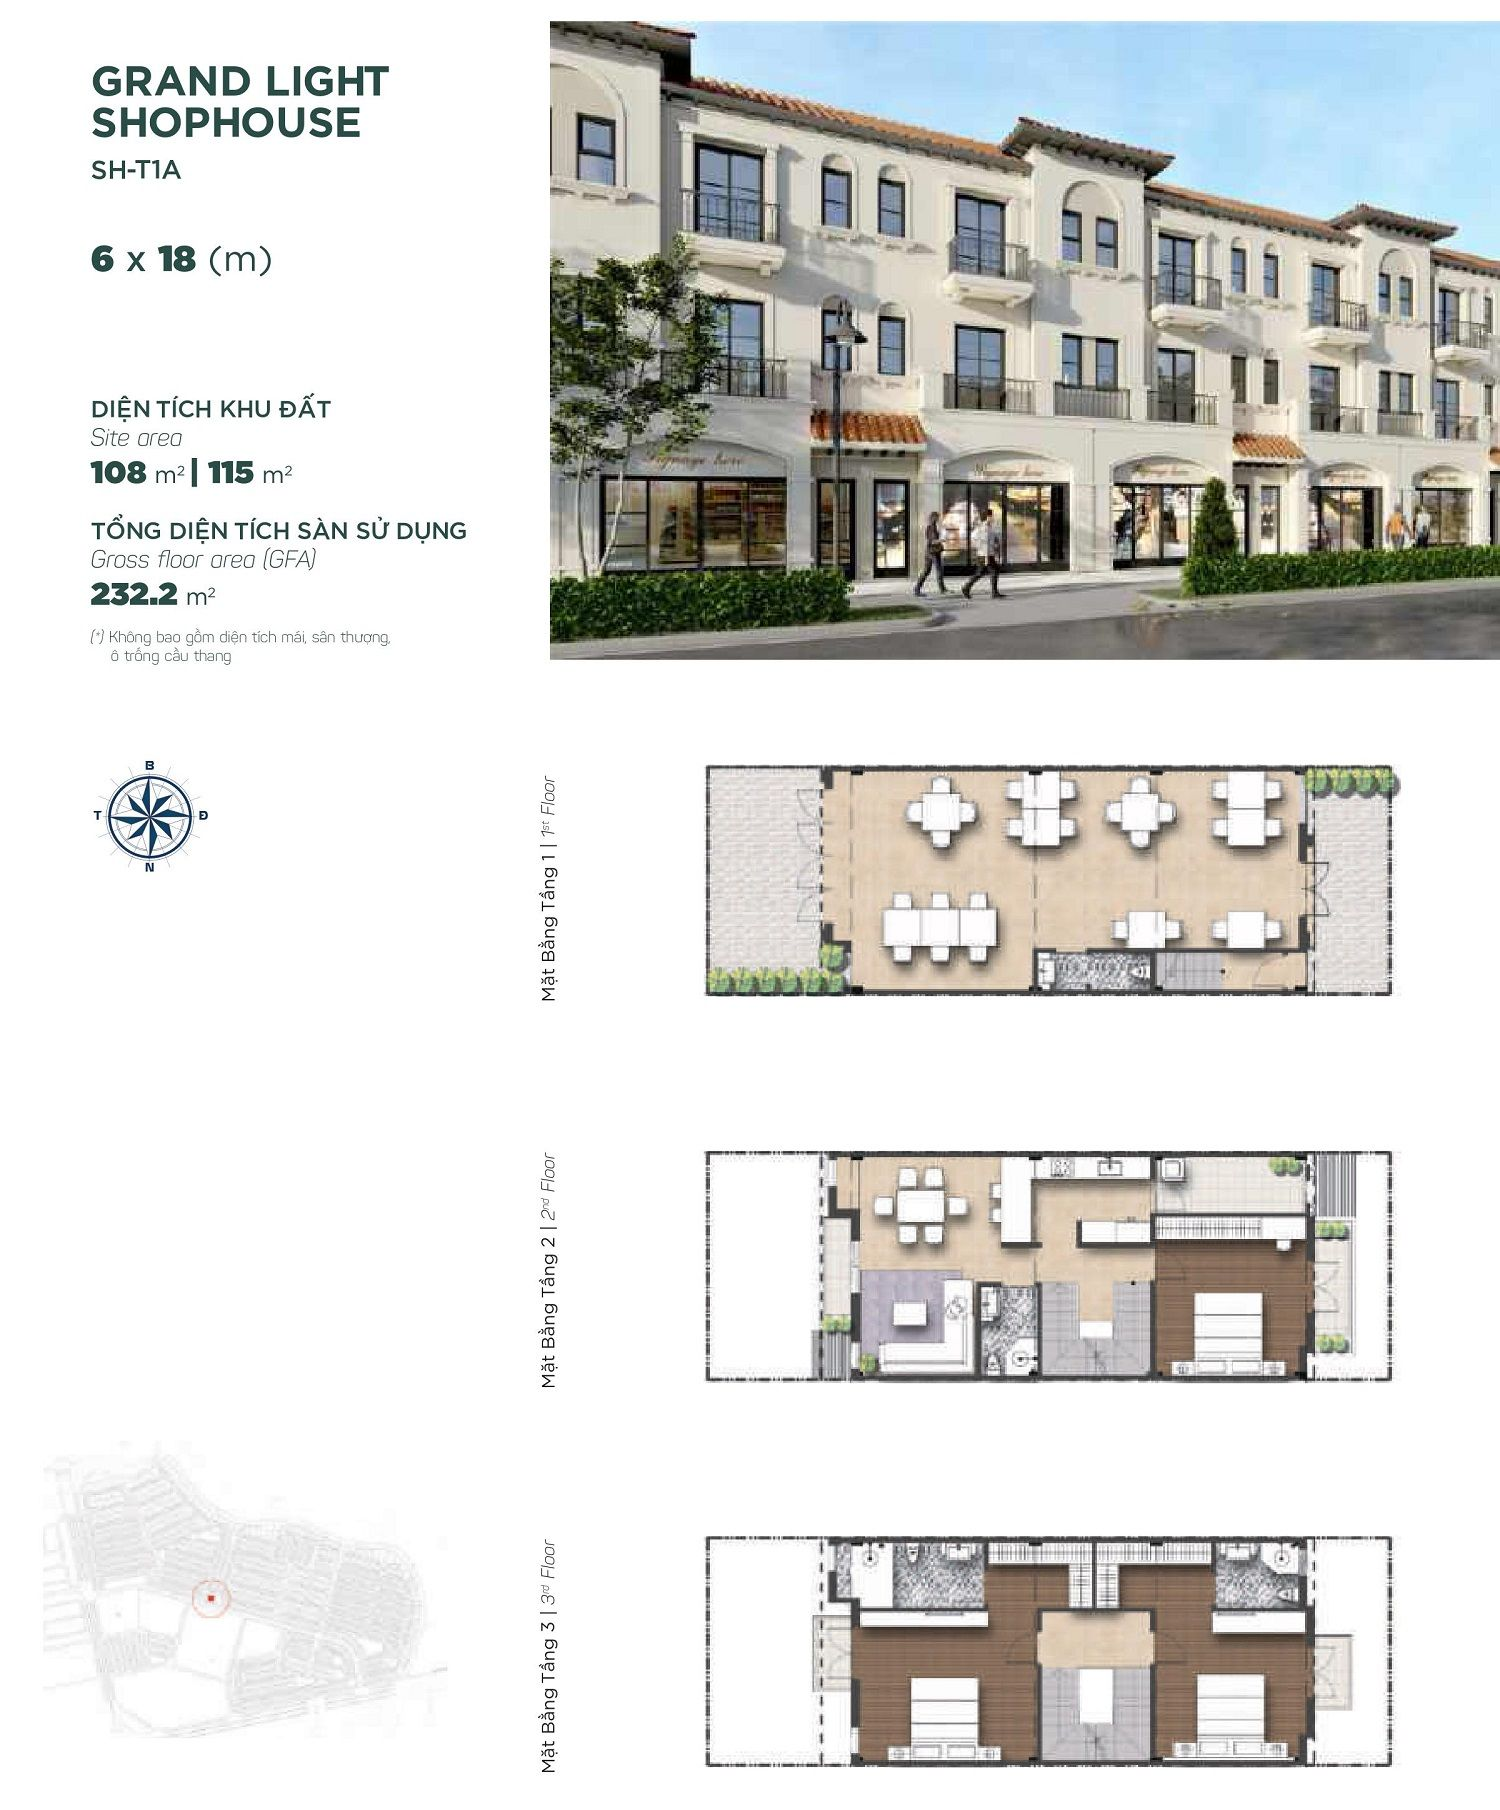 shophouse-6x18-valencia-aqua-city